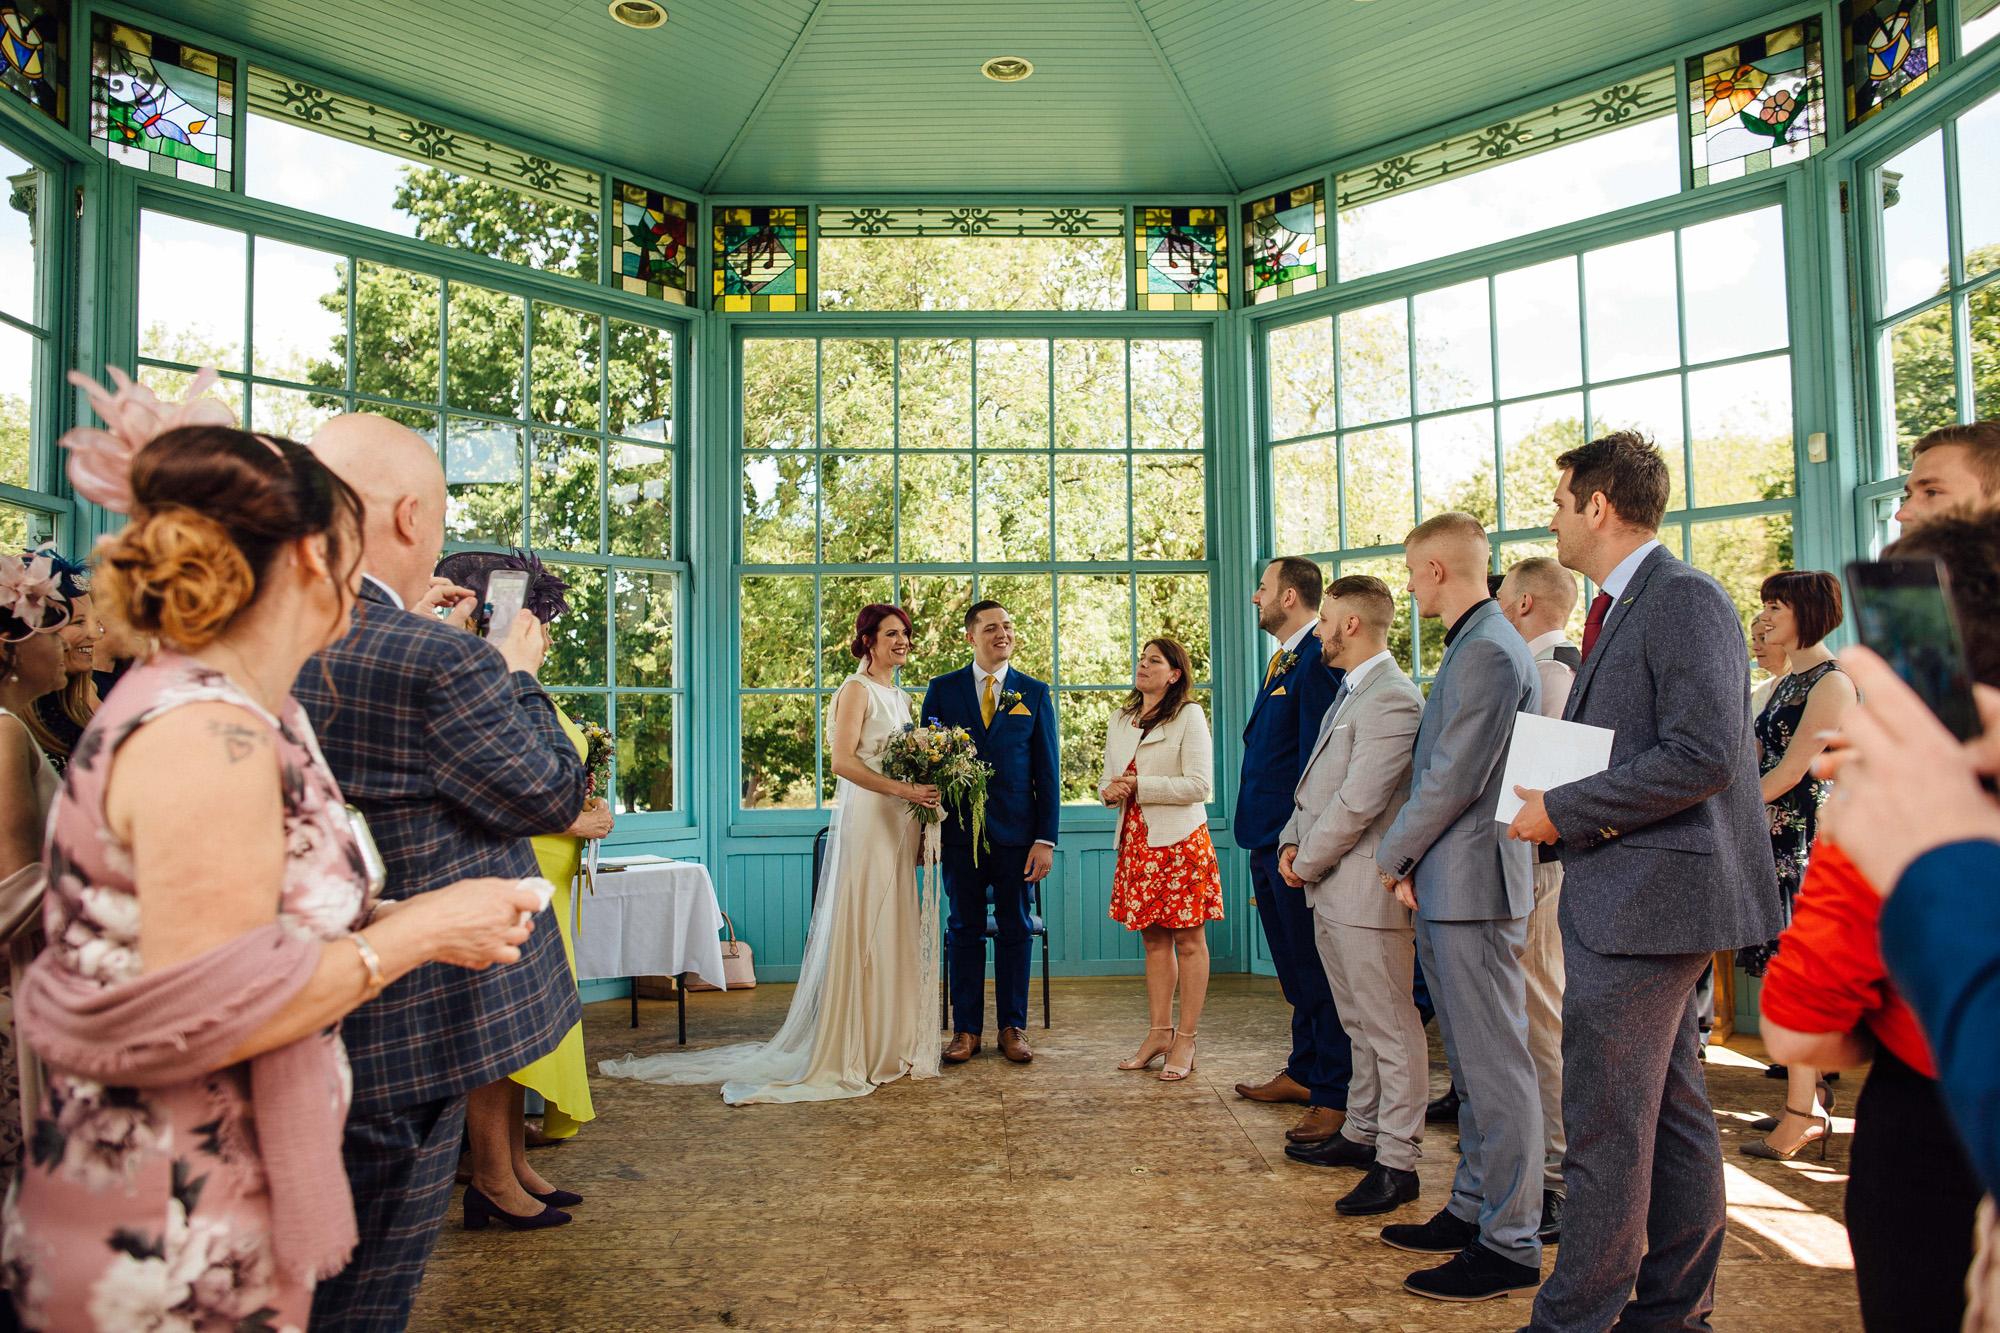 Sarah-Honeysuckle-Bias-Cut-Silk-Vintage-Inspired-Wedding-Gown-Sheffield-Wedding-Kate-Beaumont-21.jpg